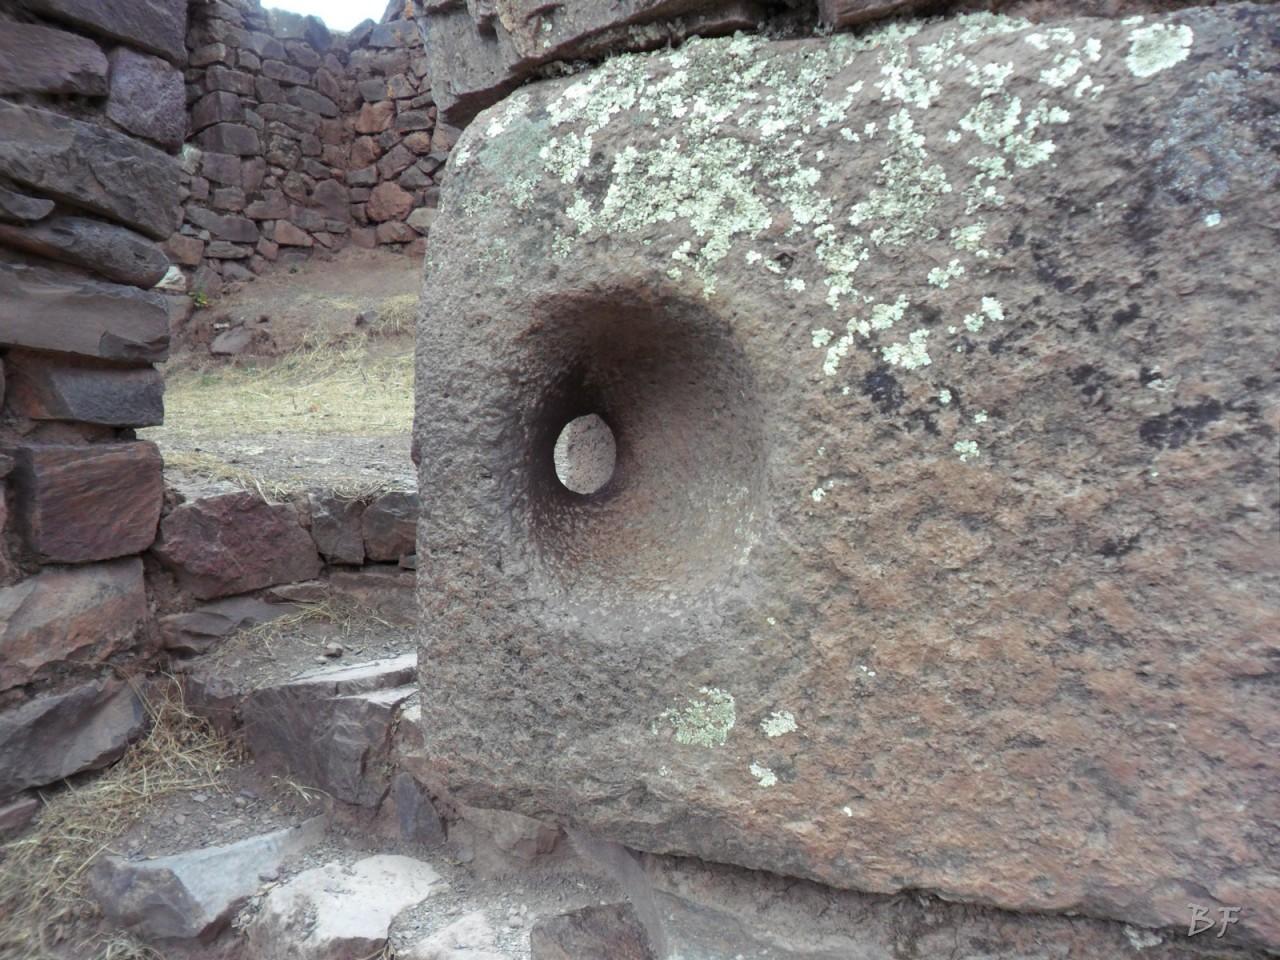 Mura-Poligonali-Megaliti-Altari-Rupestri-Pisac-Cusco-Perù-17